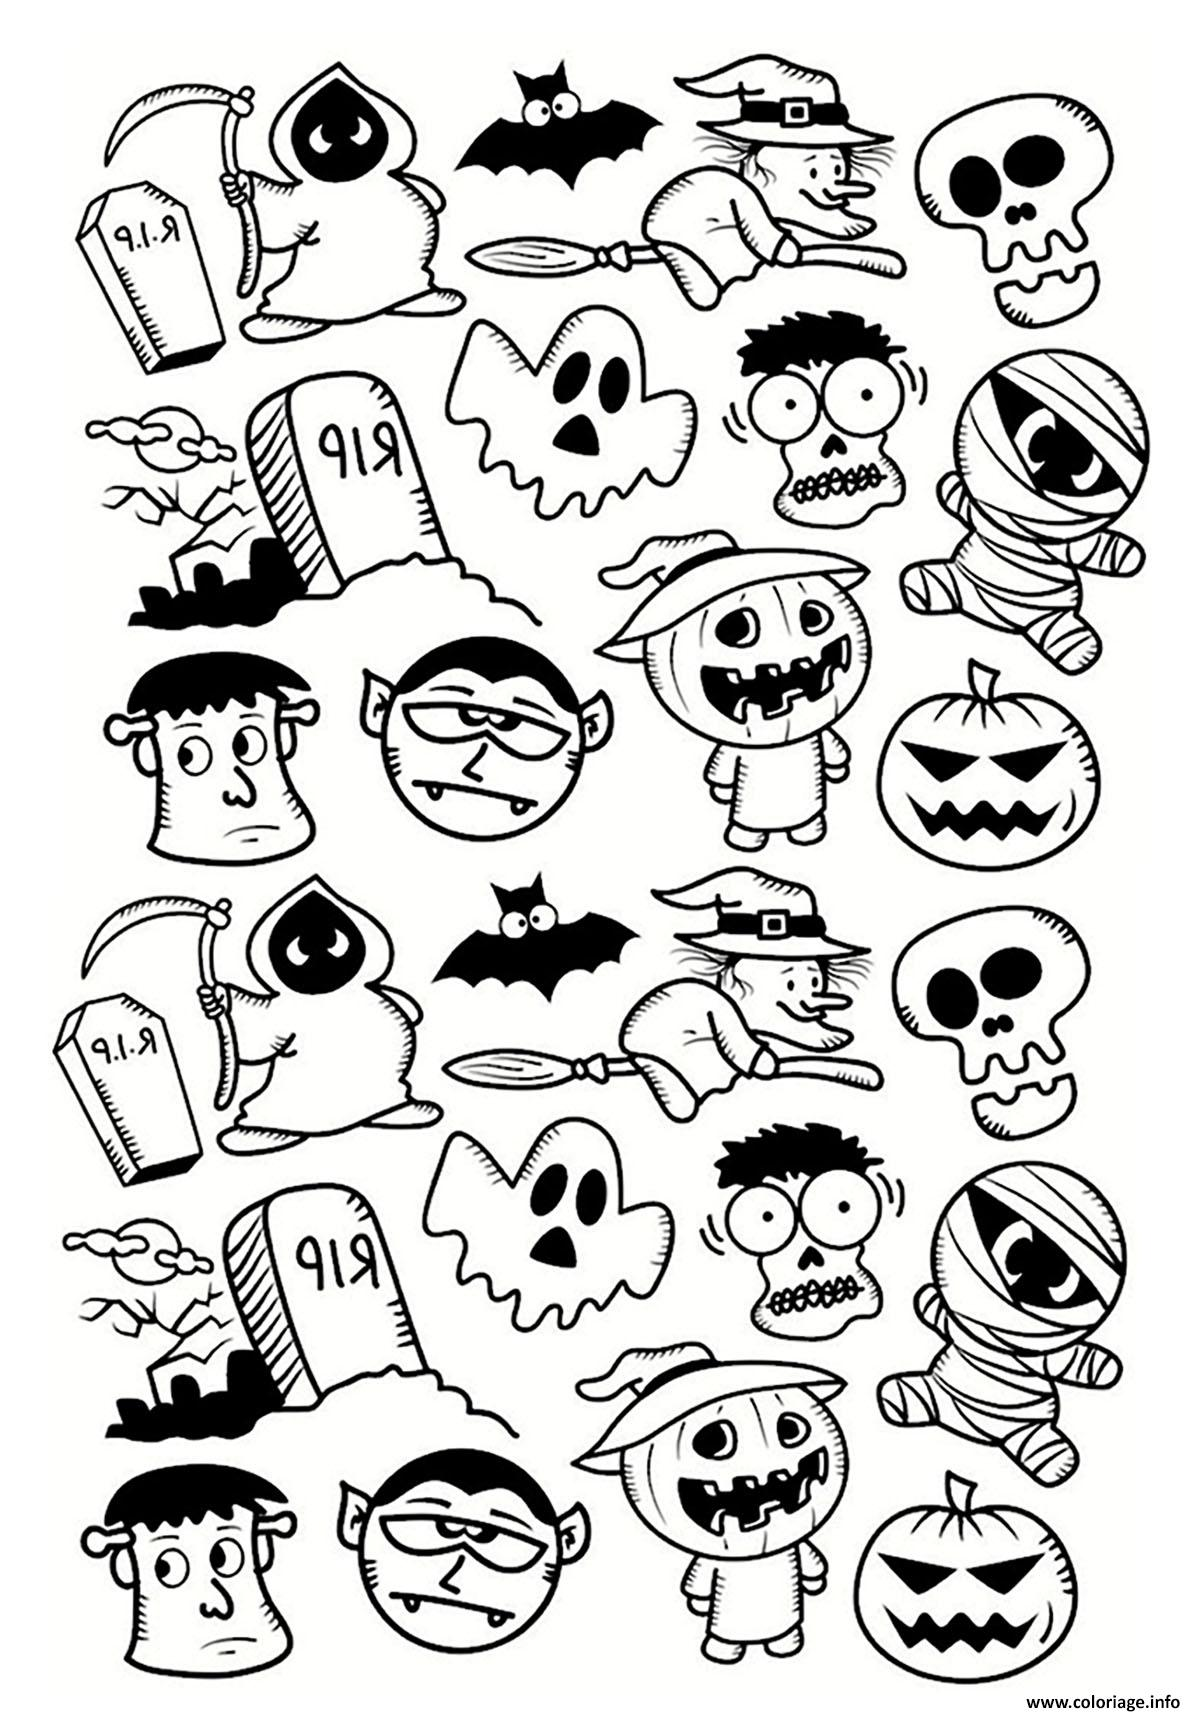 Coloriage Halloween Fantome Vampire Citrouille Doodle Dessin